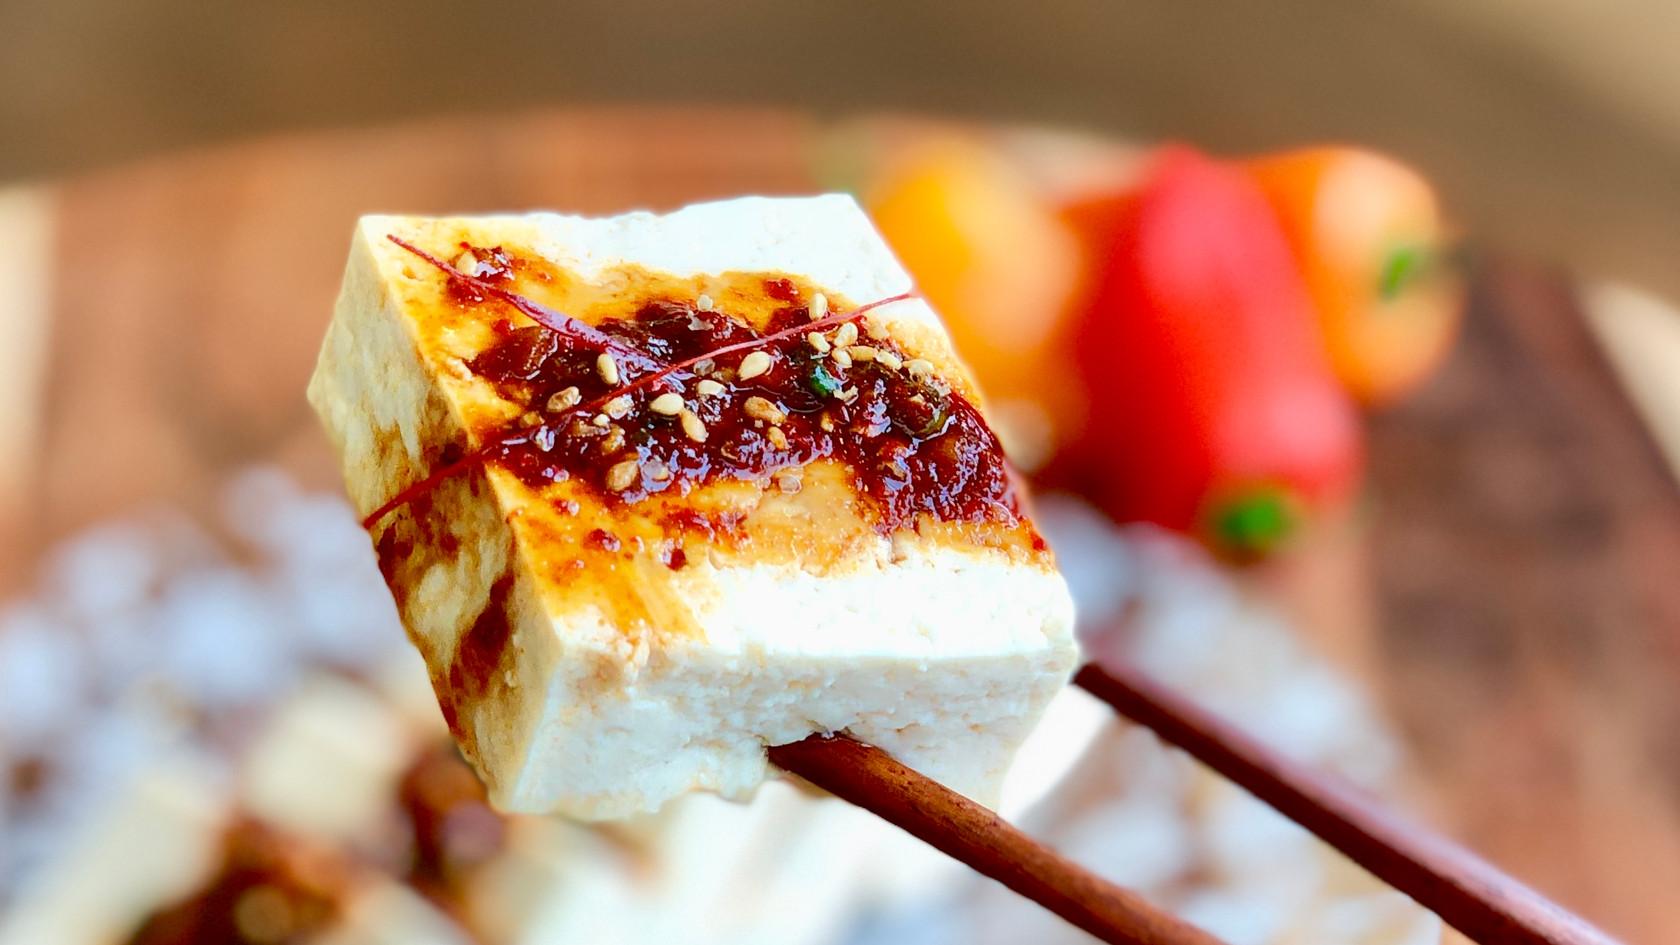 Firm Tofu With Soy-Sauce Seasoning Sauce (두부 양념간장 반찬)